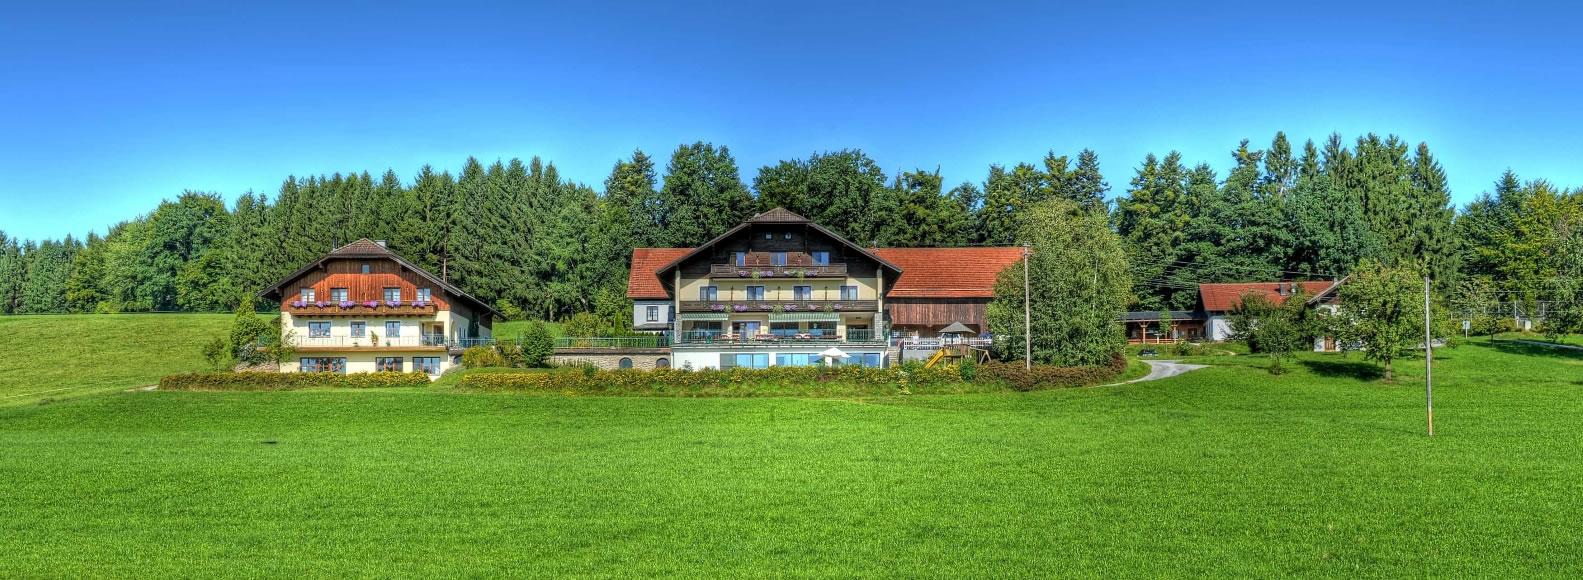 Bio-Hotel Schiessentobel in Seeham